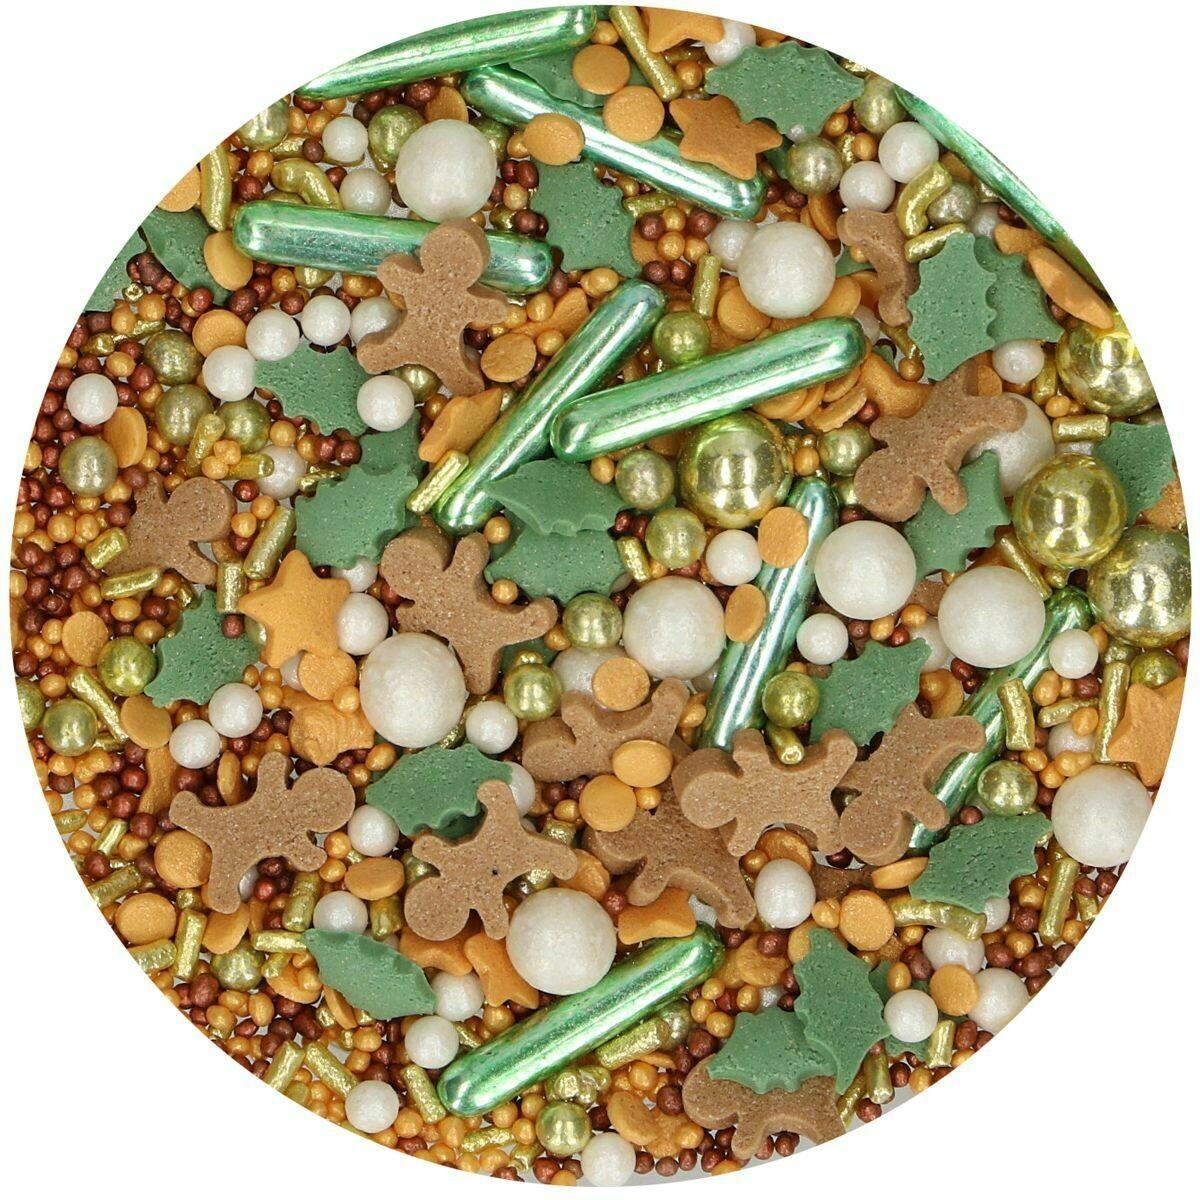 FunCakes Sprinkle Mix 65γρ -JOYFUL MEDLEY - Μείγμα  Ζαχαρωτών Χριστουγεννιάτικο